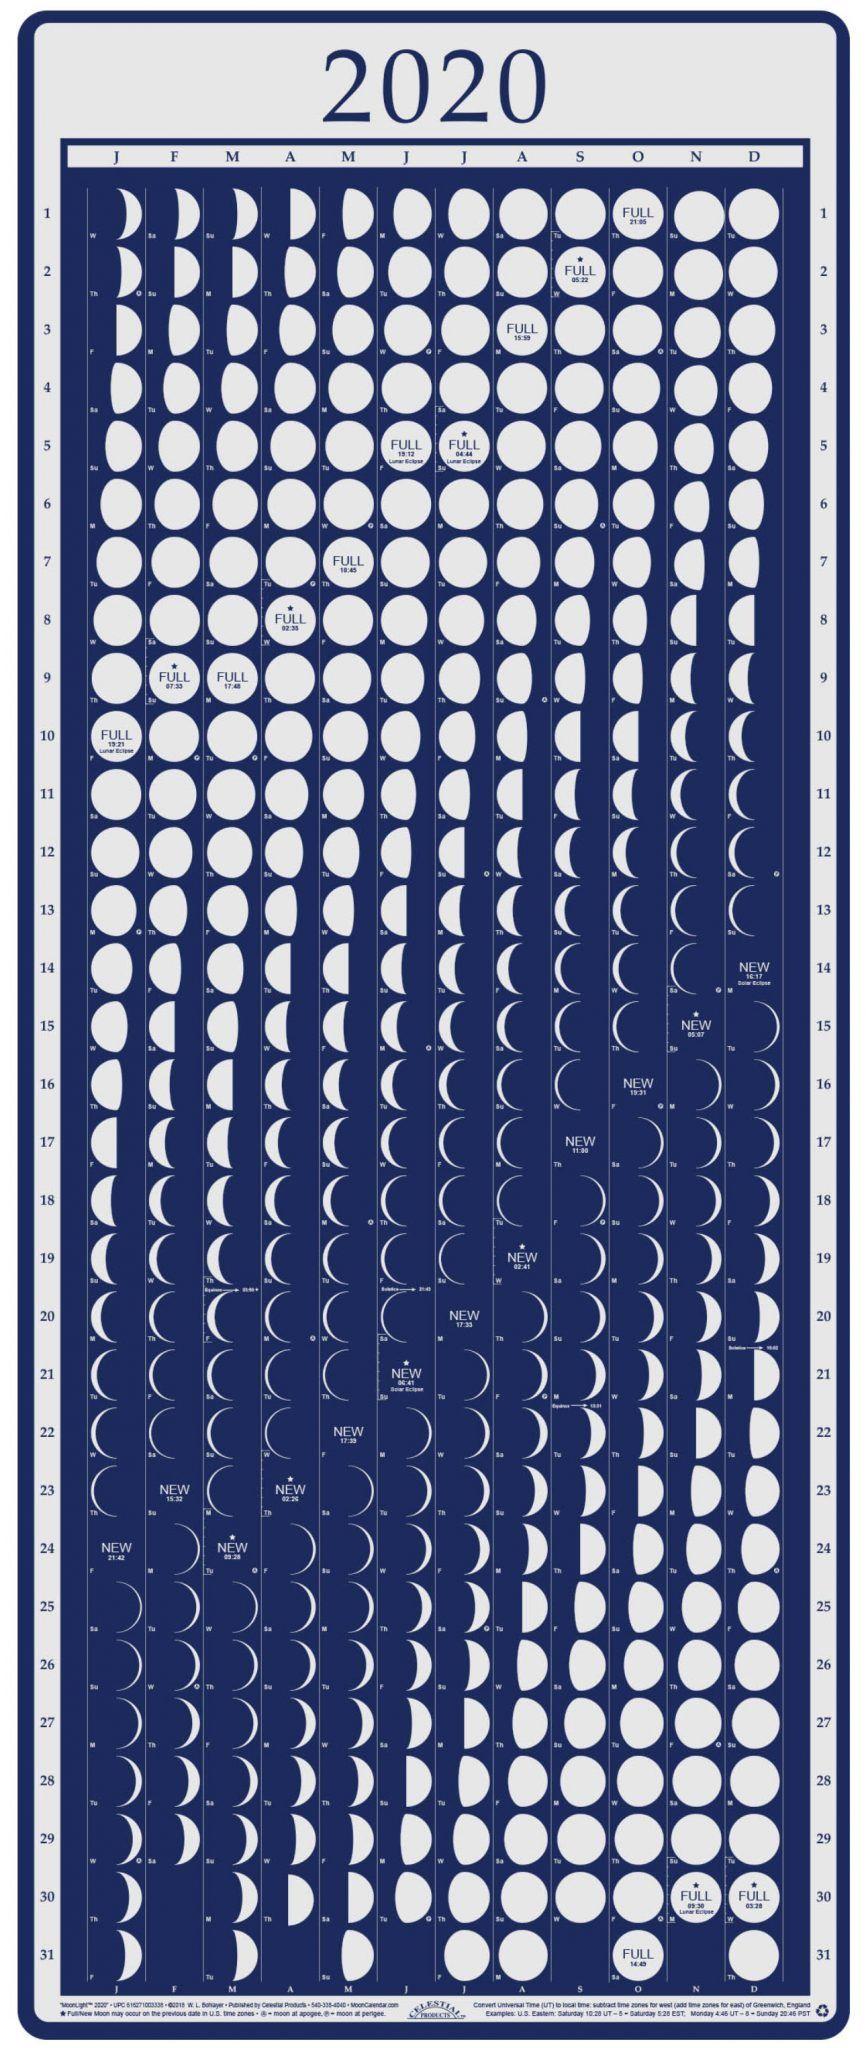 Full Moon Calendar 2020 Phases Kalendar Nauchnye Proekty Luna